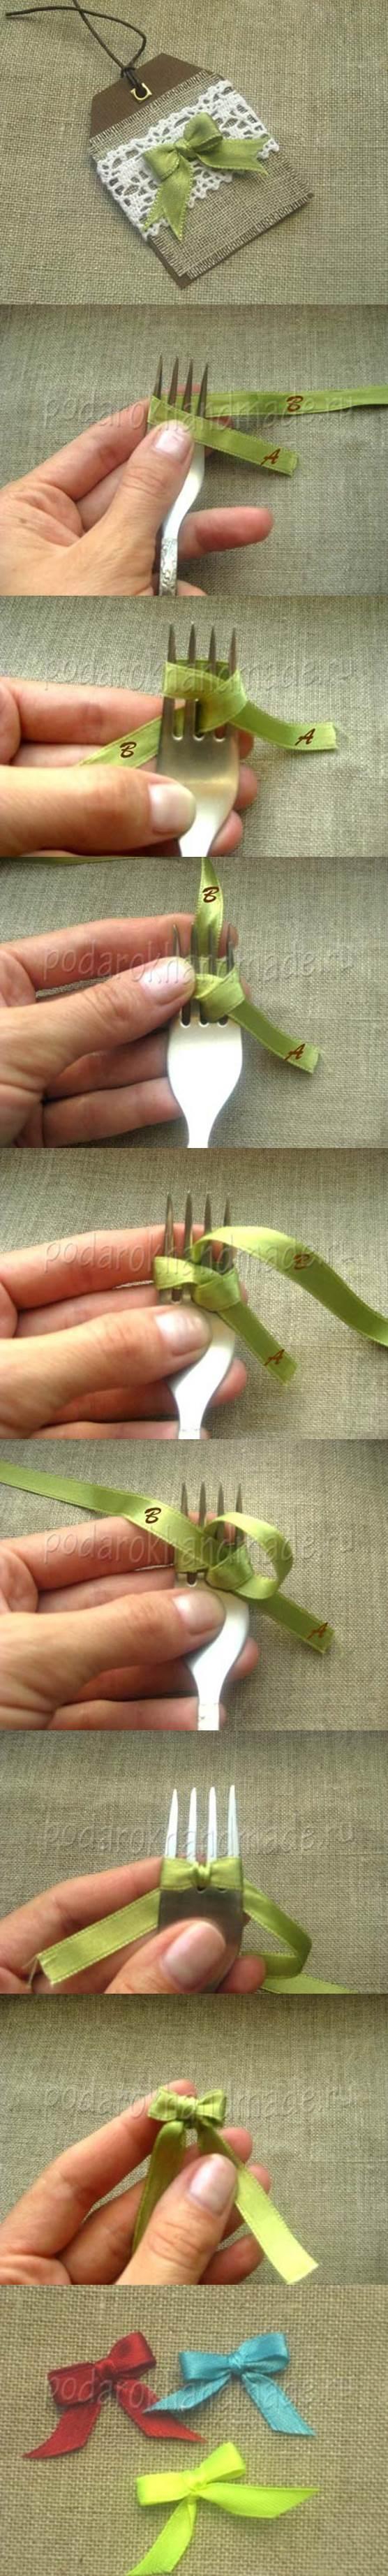 DIY Satin Ribbon Bow with a Fork 2